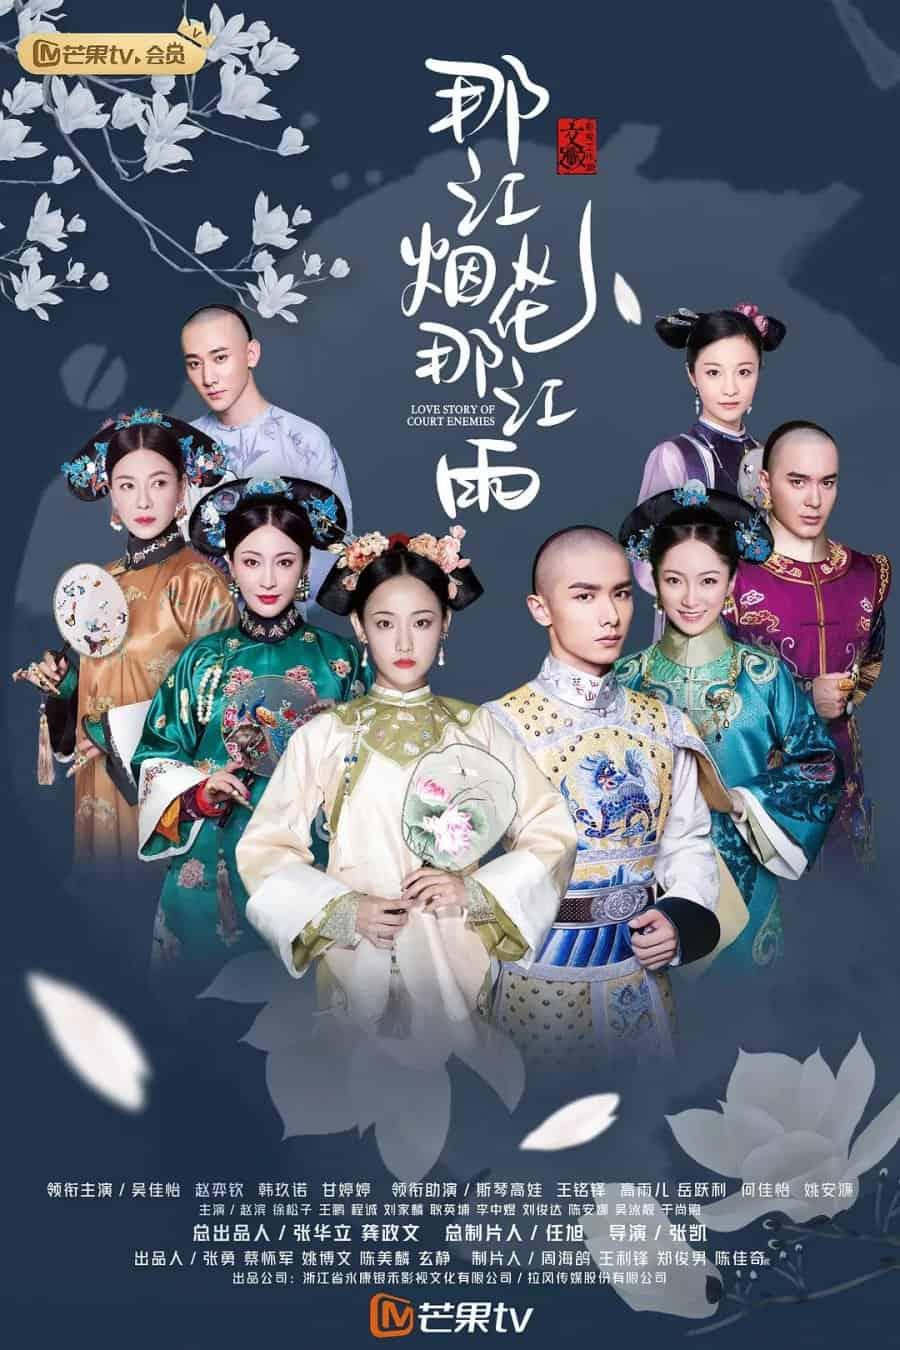 Love Story of Court Enemies (2020) ศึกรักศึกสวาท ซับไทย EP1 – EP25 [จบ]